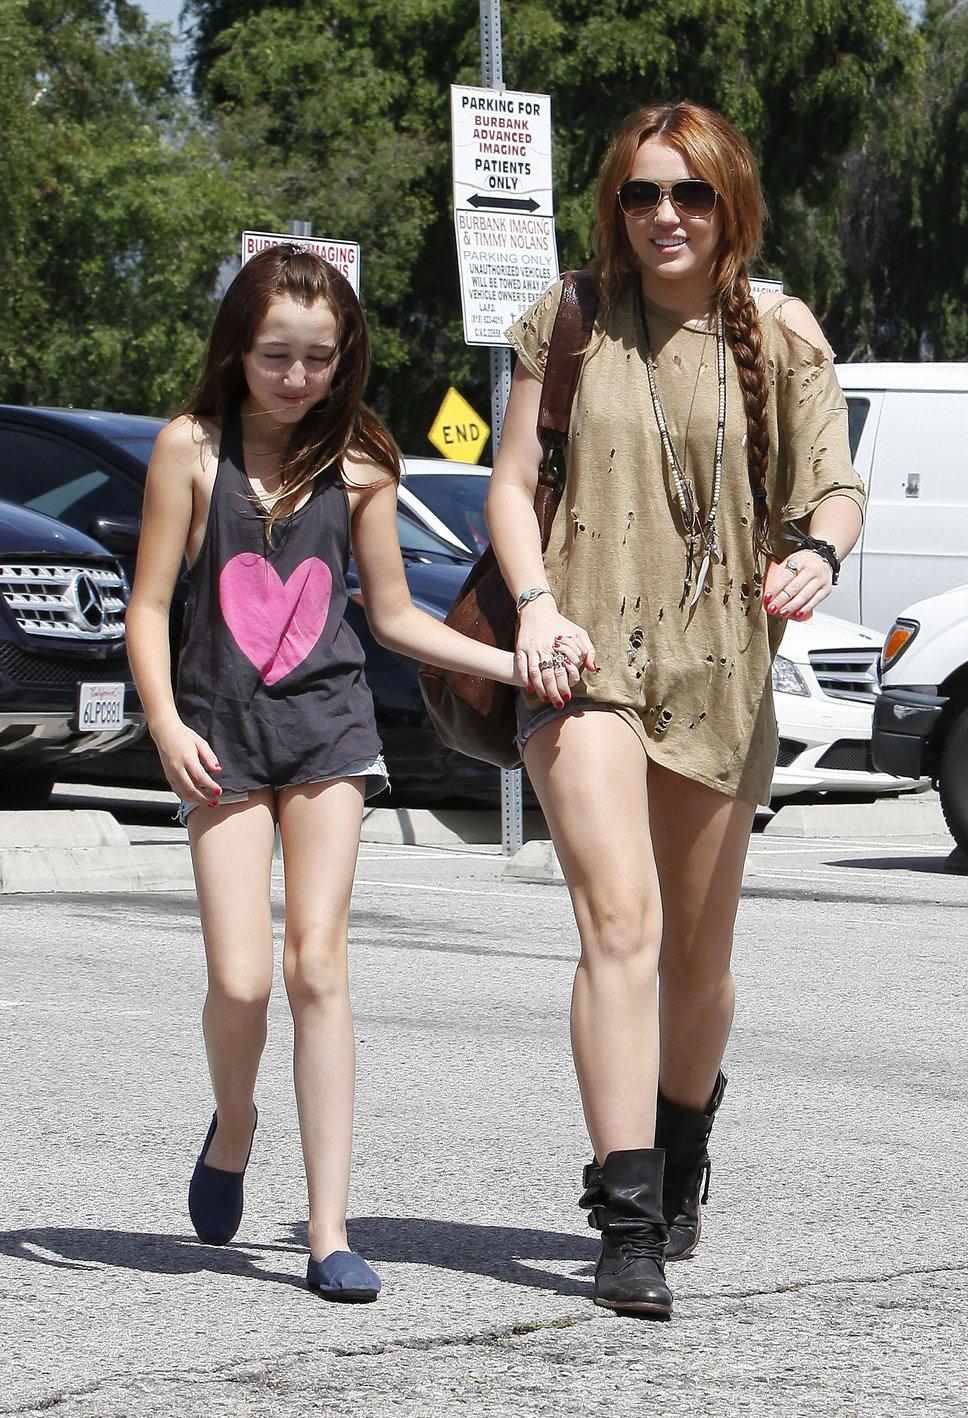 Noah Lindsey Cyrus | Hannah Montana Wiki | FANDOM powered ...